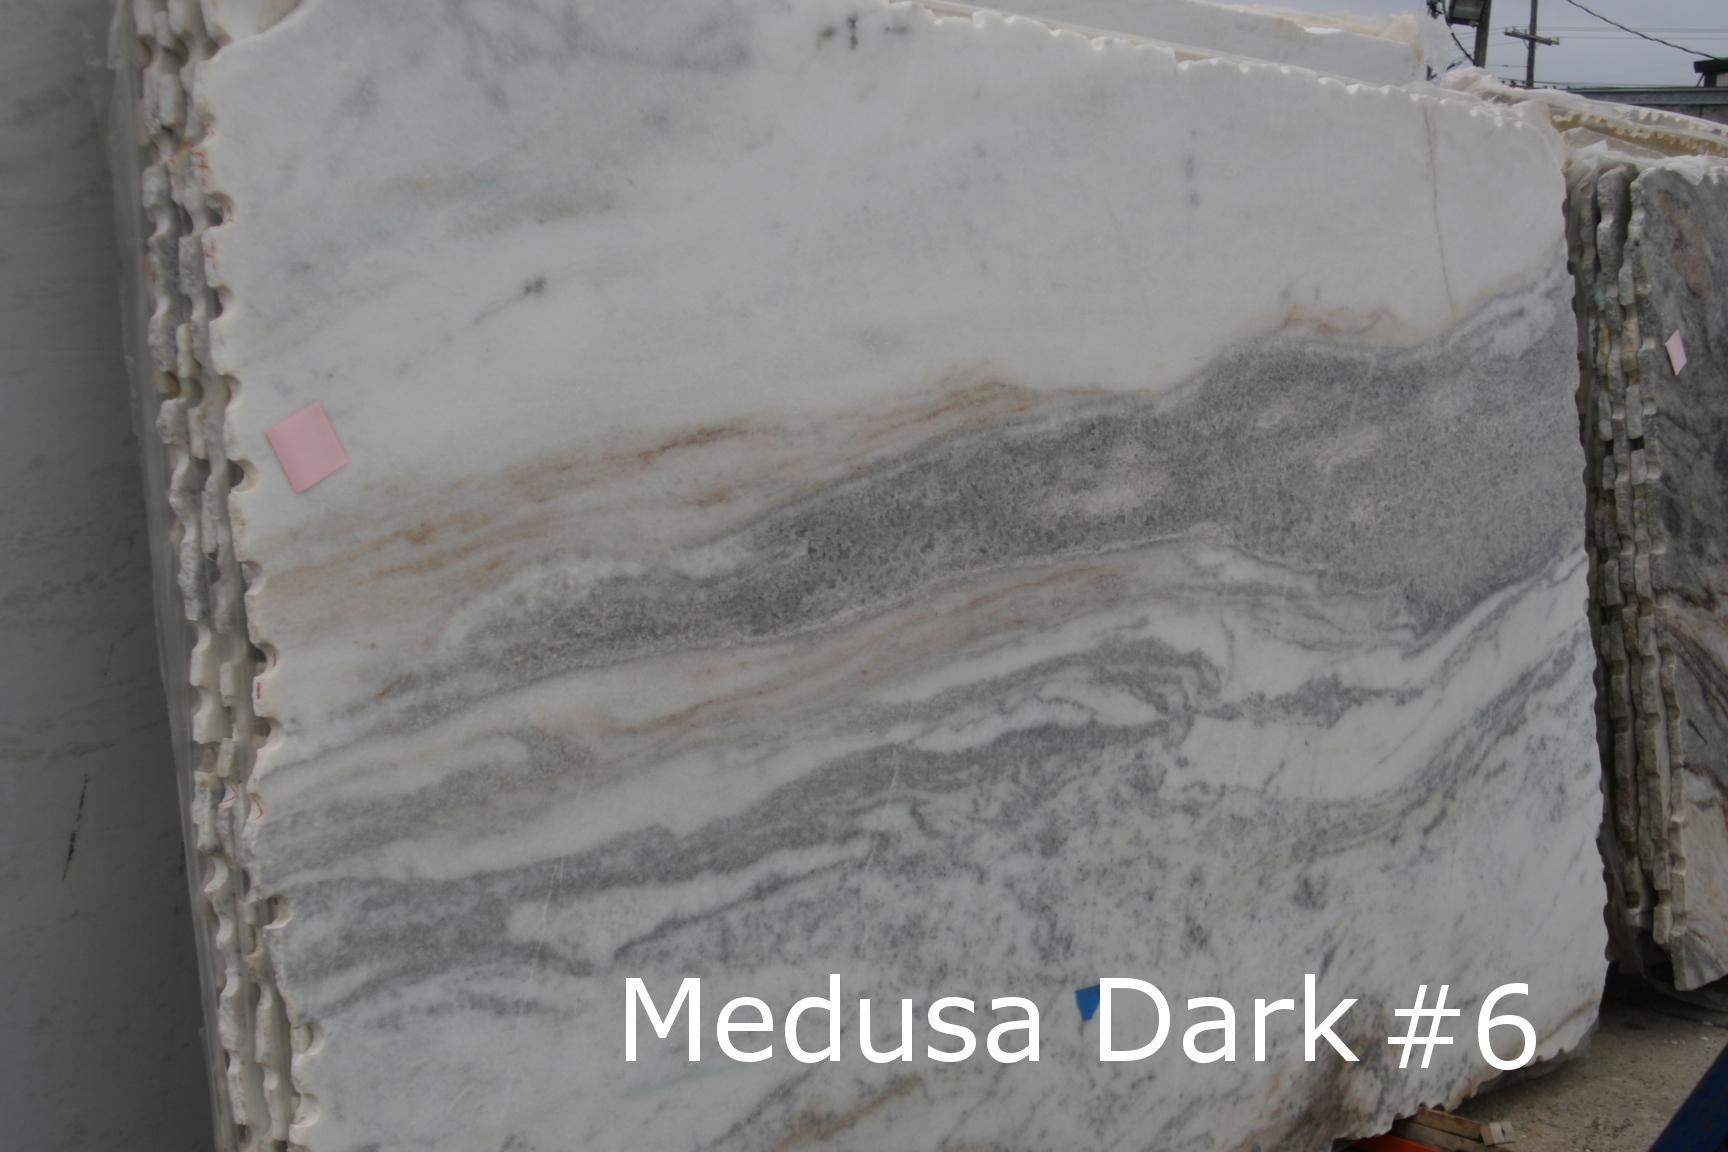 Medusa Dark #6